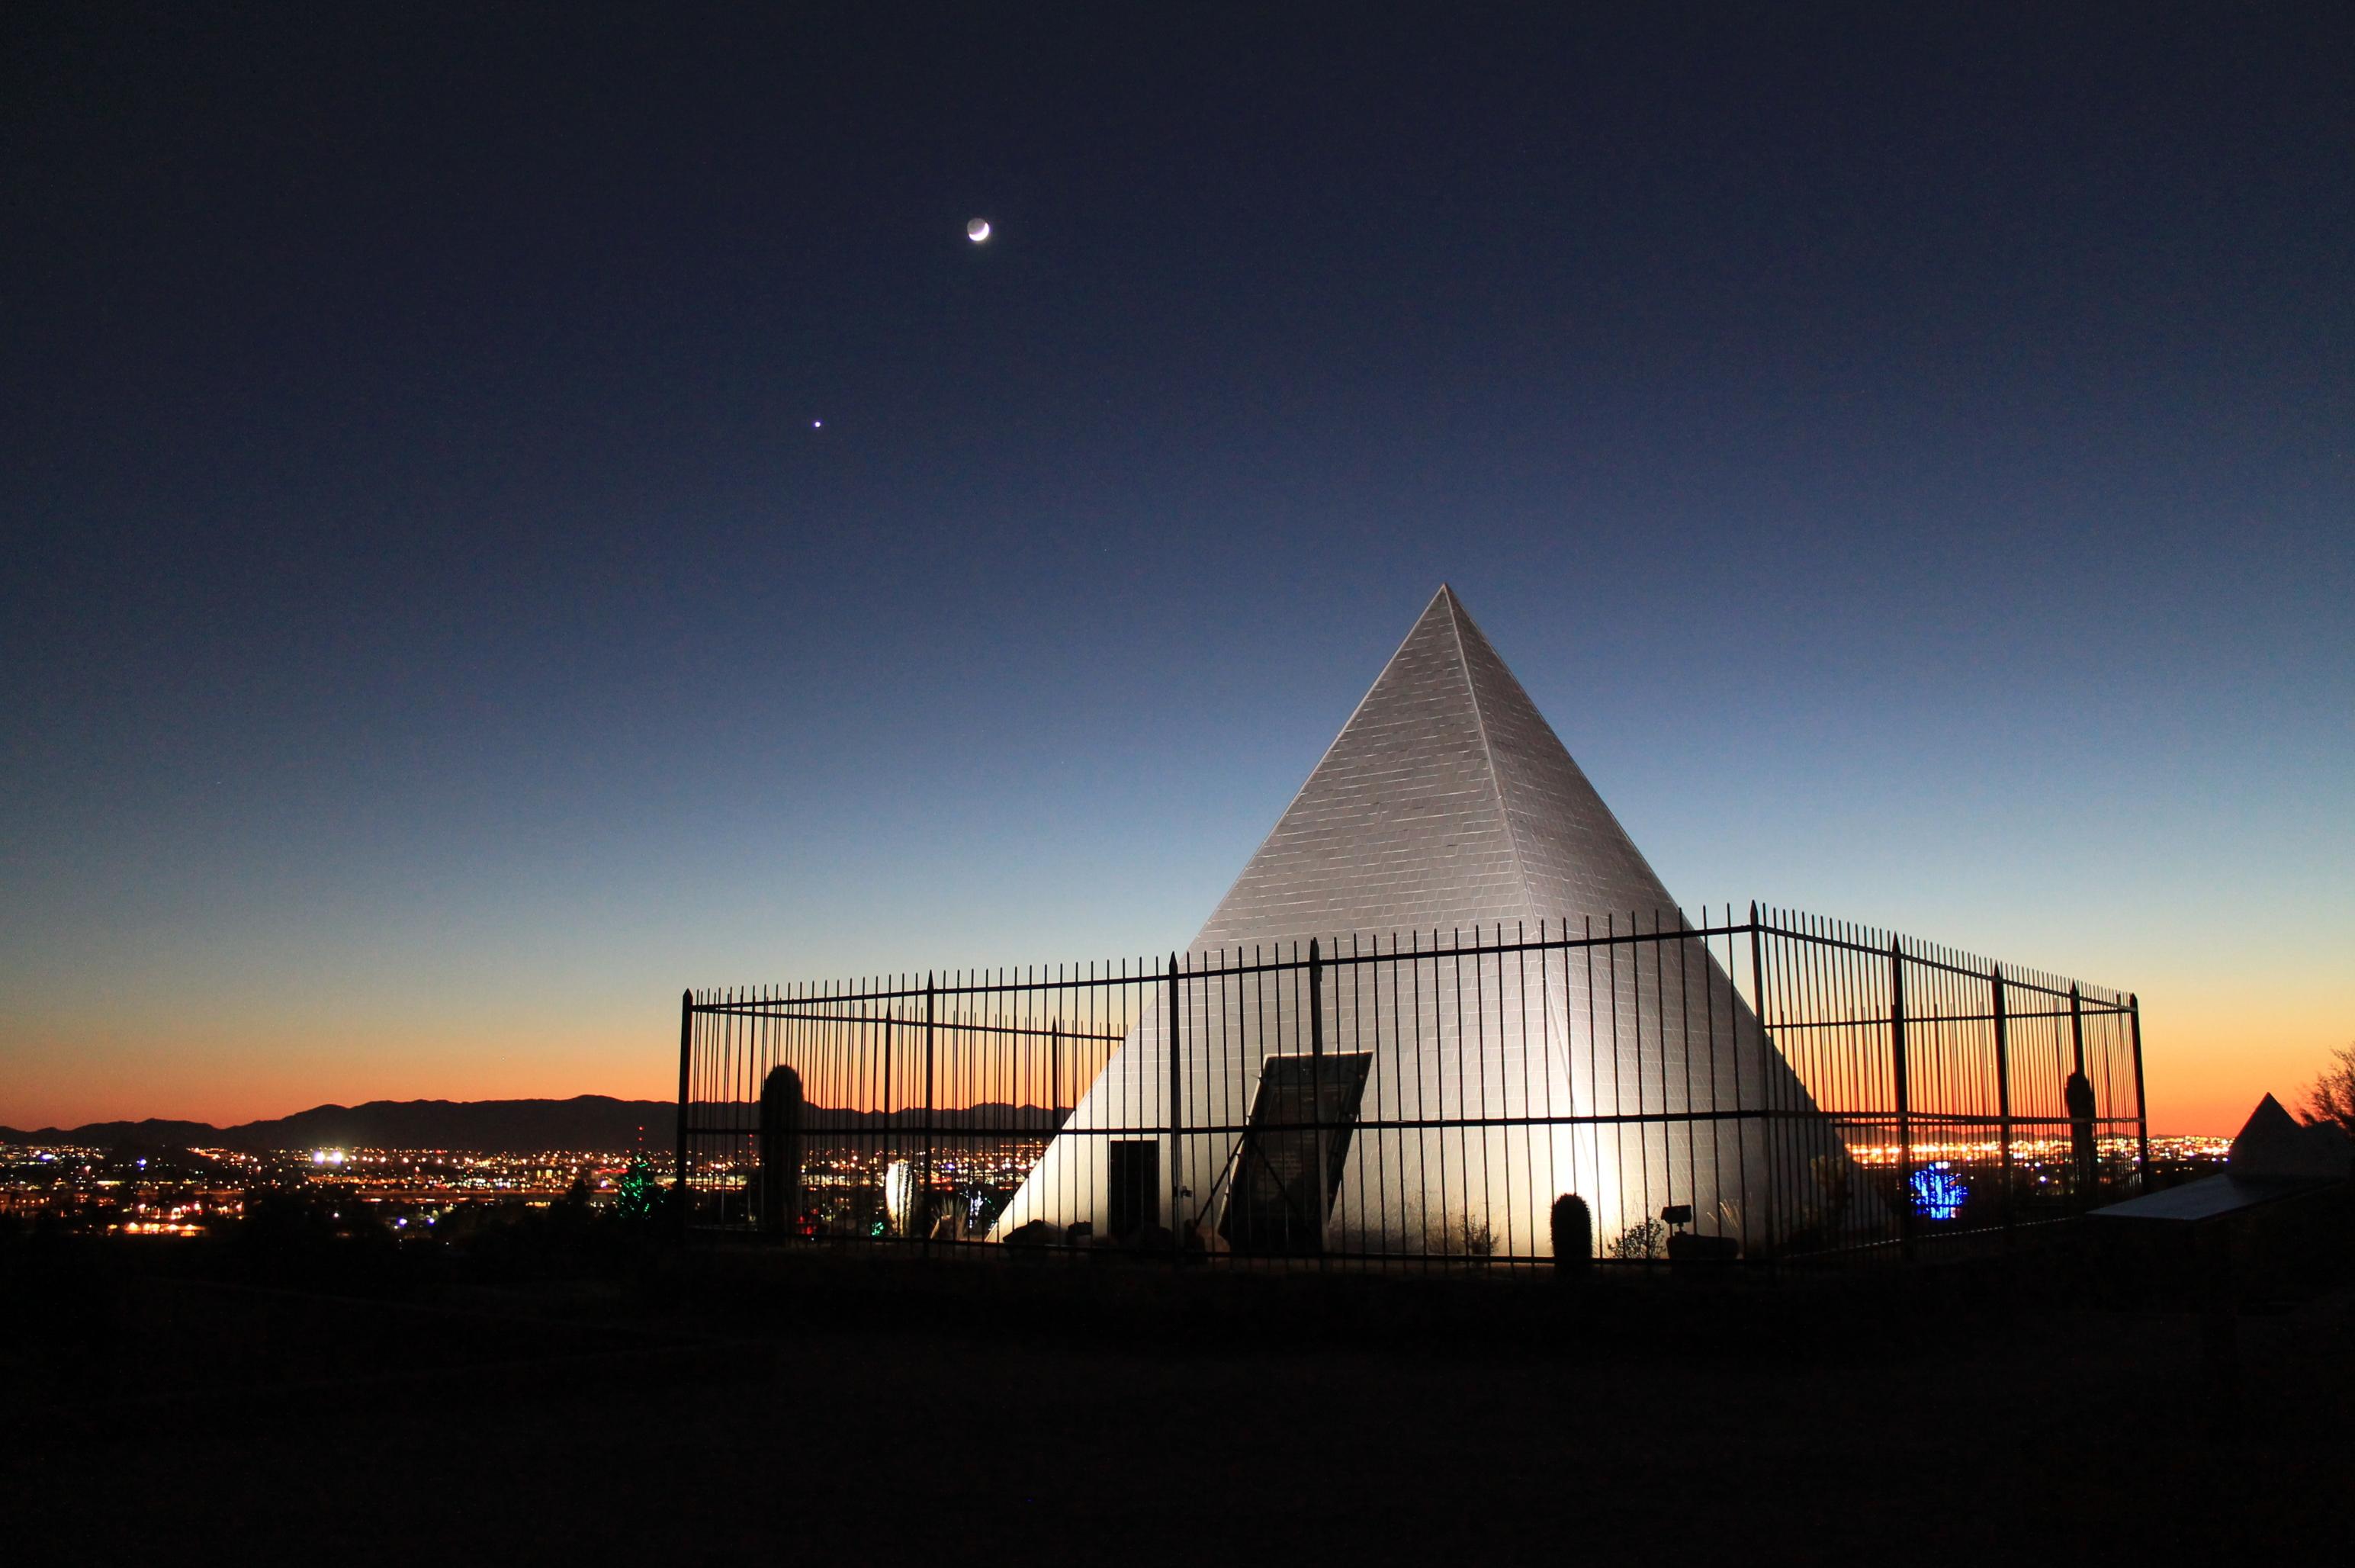 File:Hunts Tomb Papago Park Phoenix AZ.jpg - Wikimedia Commons